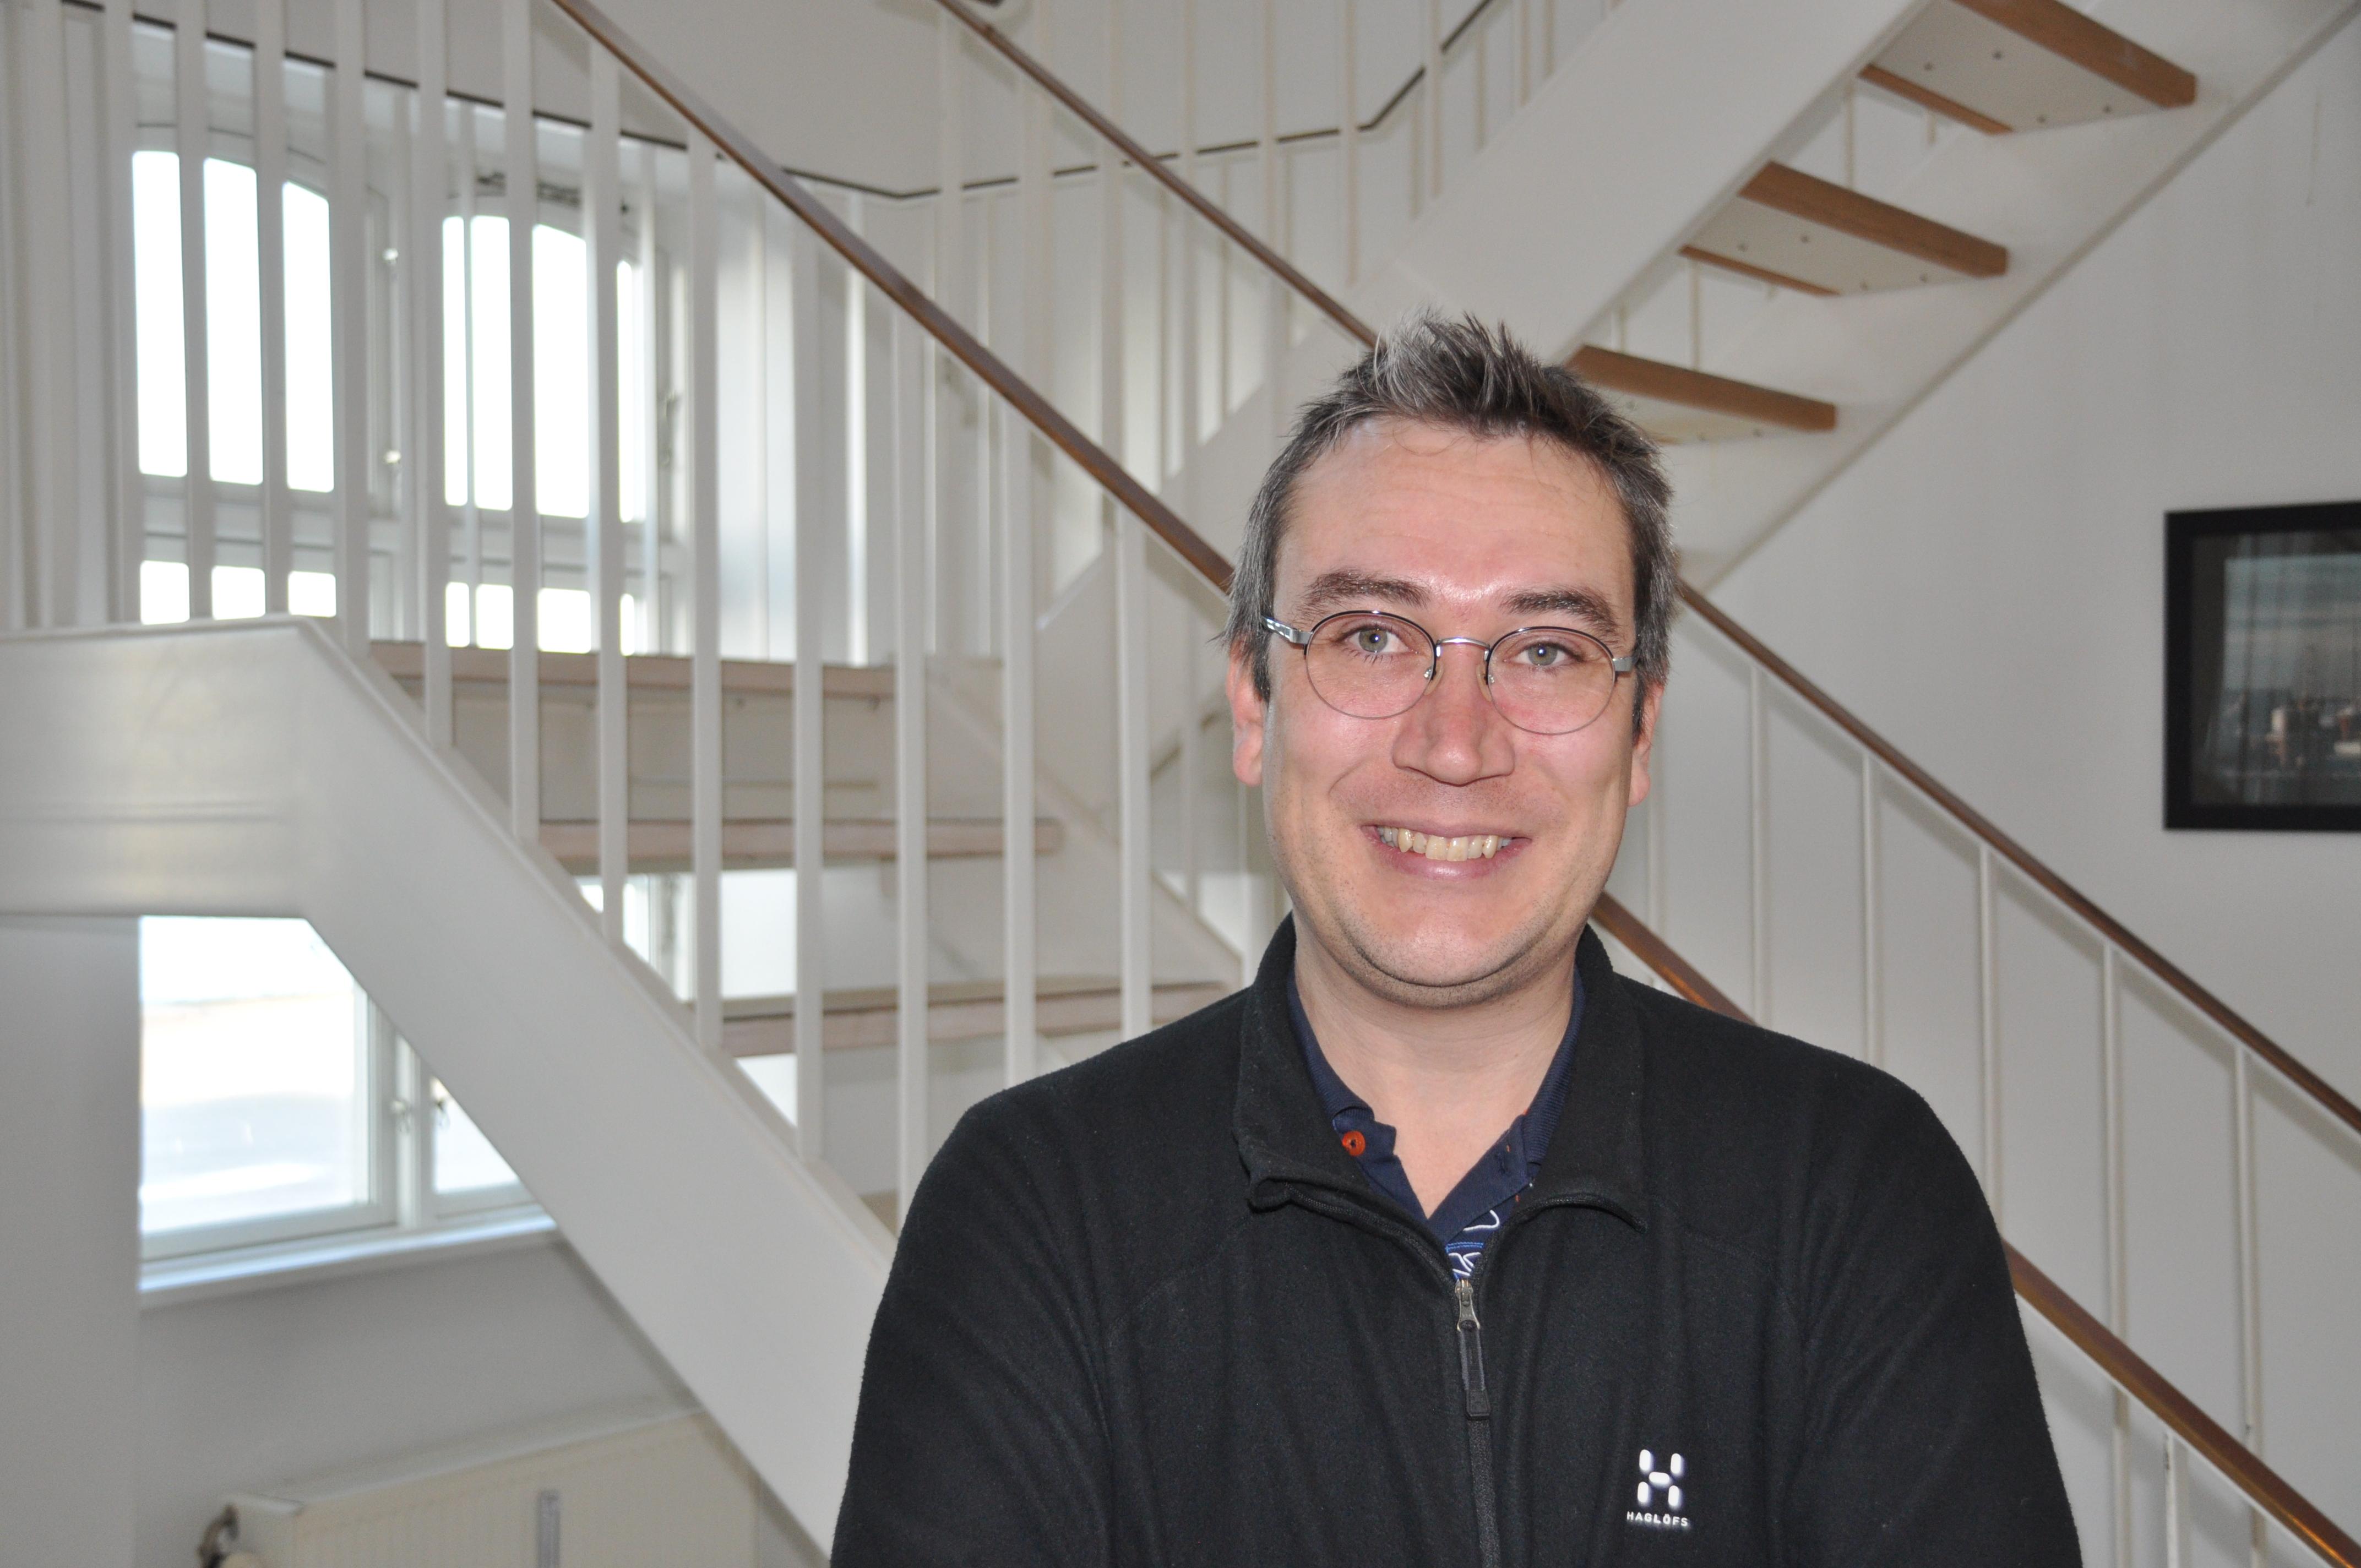 Brian Lønberg